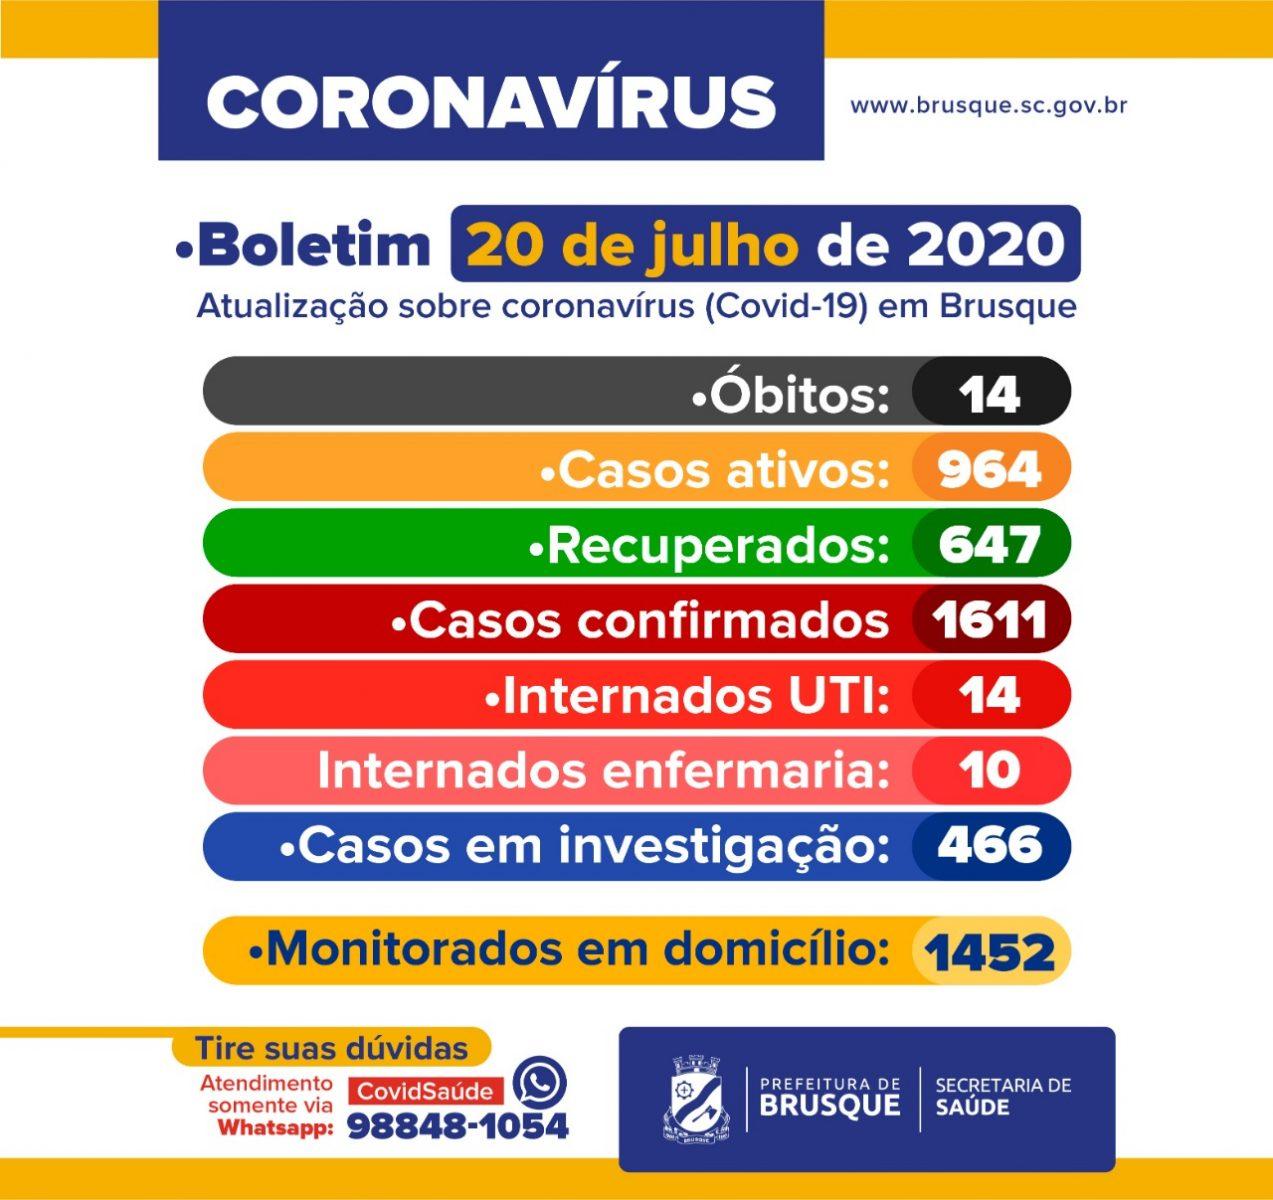 Confira o boletim epidemiológico da Prefeitura de Brusque nesta segunda-feira (20)